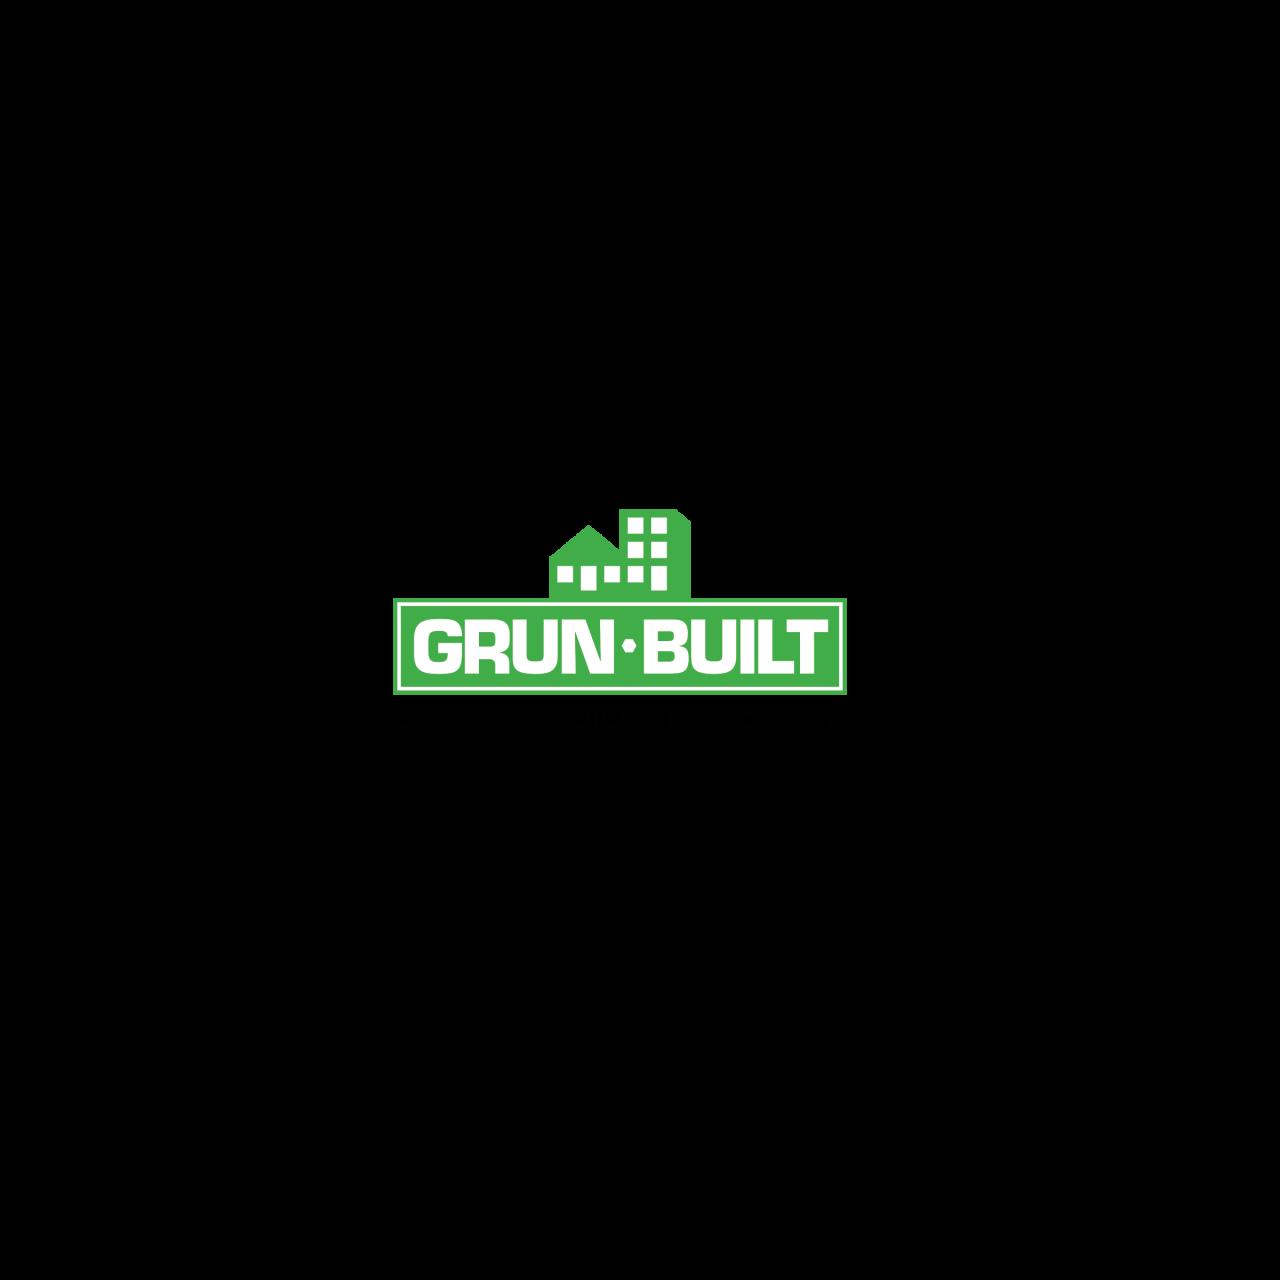 Image of Grun Built logo color alternate